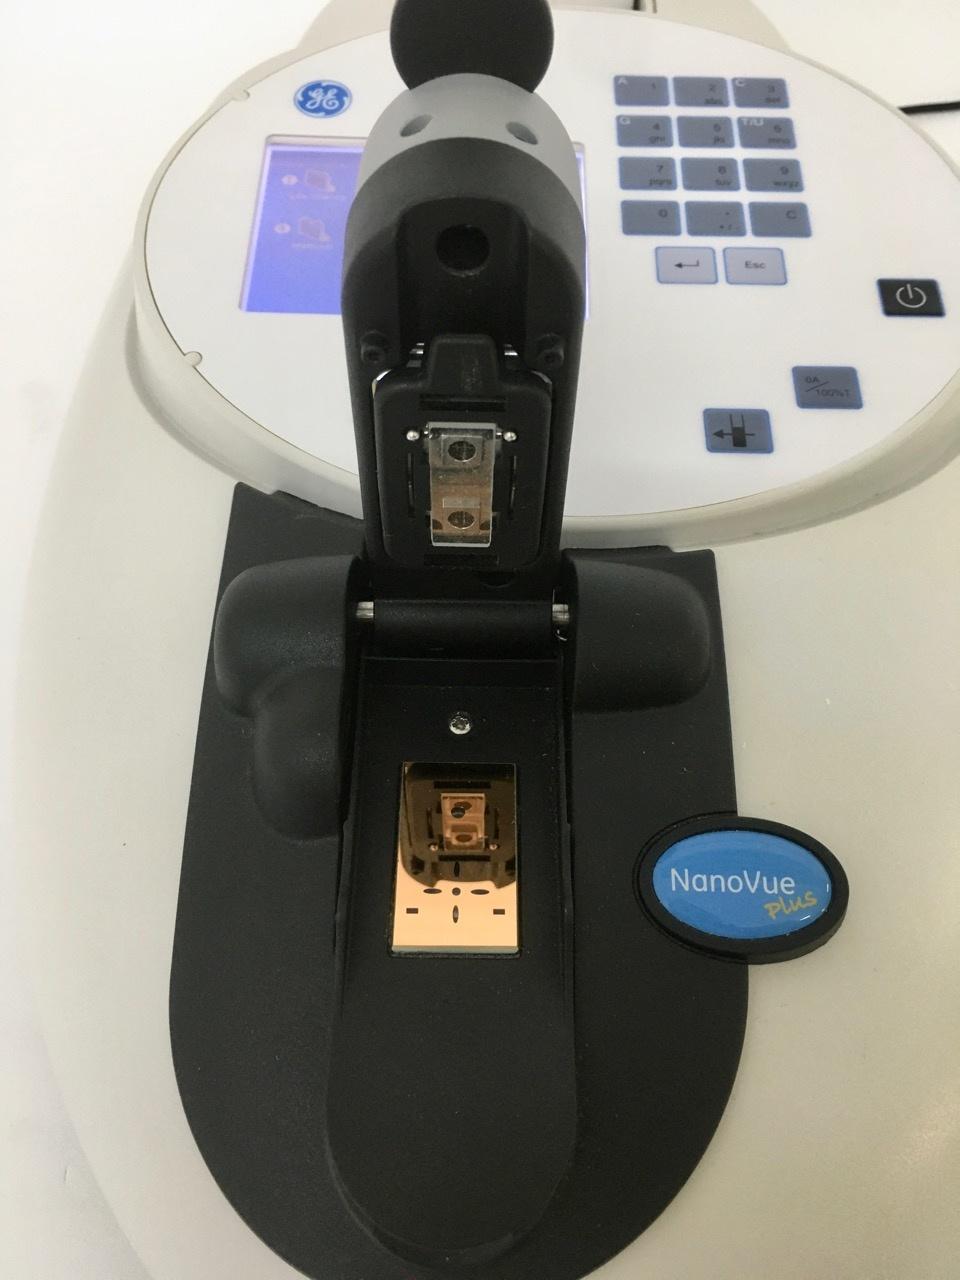 Ge Healthcare GE Healthcare NanoVue Plus Spectrophotometer